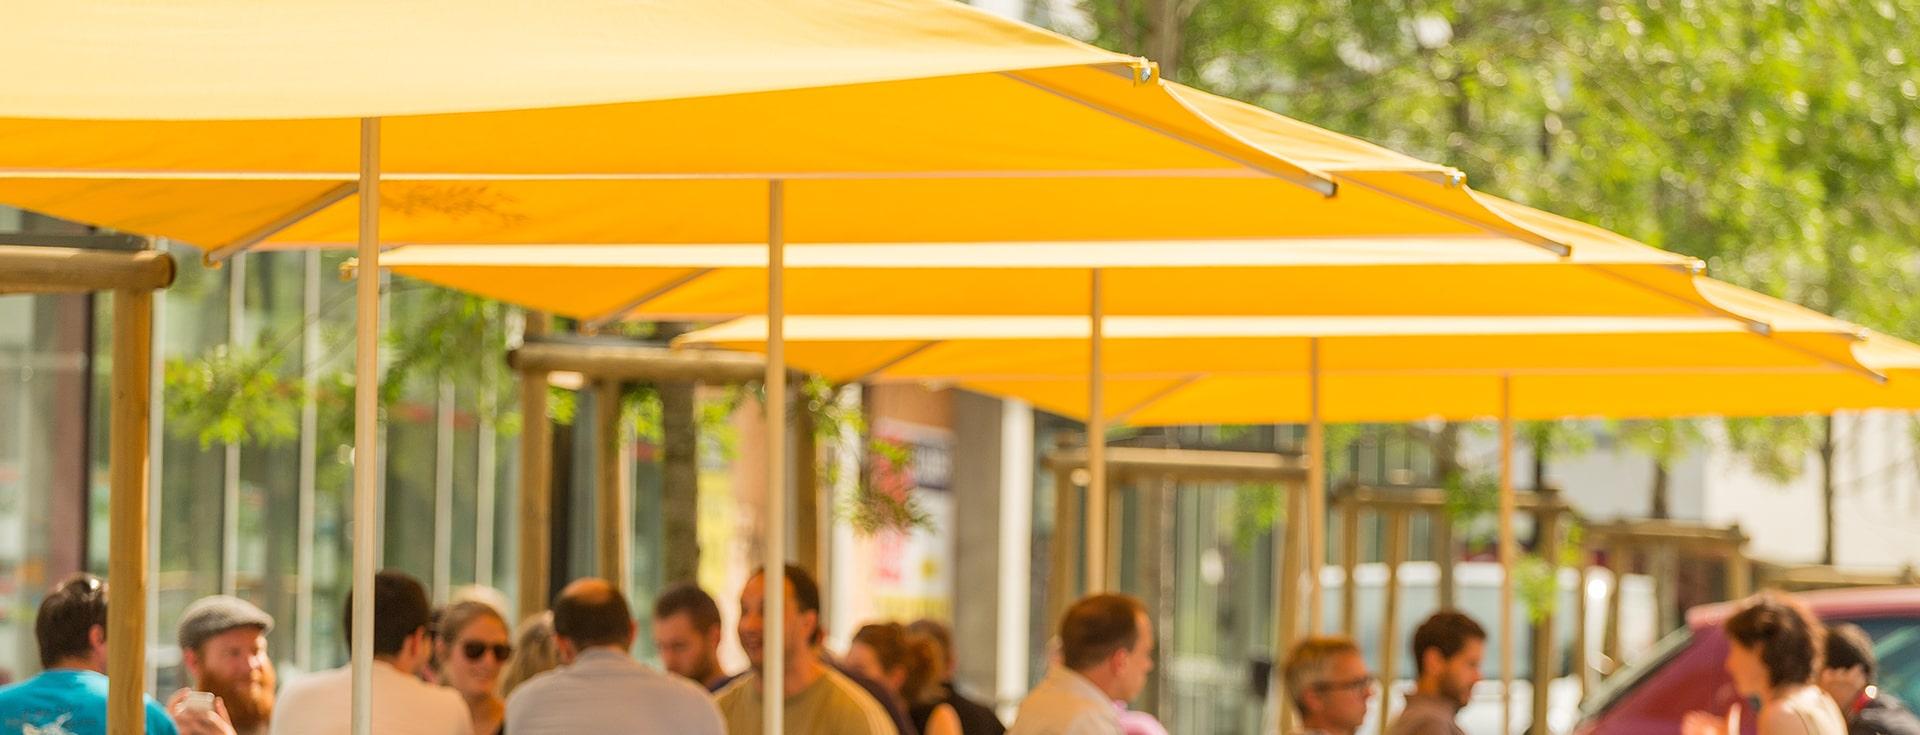 Parasol professionel Nantes - modele Cortina 3x3 - Restaurant Les Brassés - Zoom a tester-min